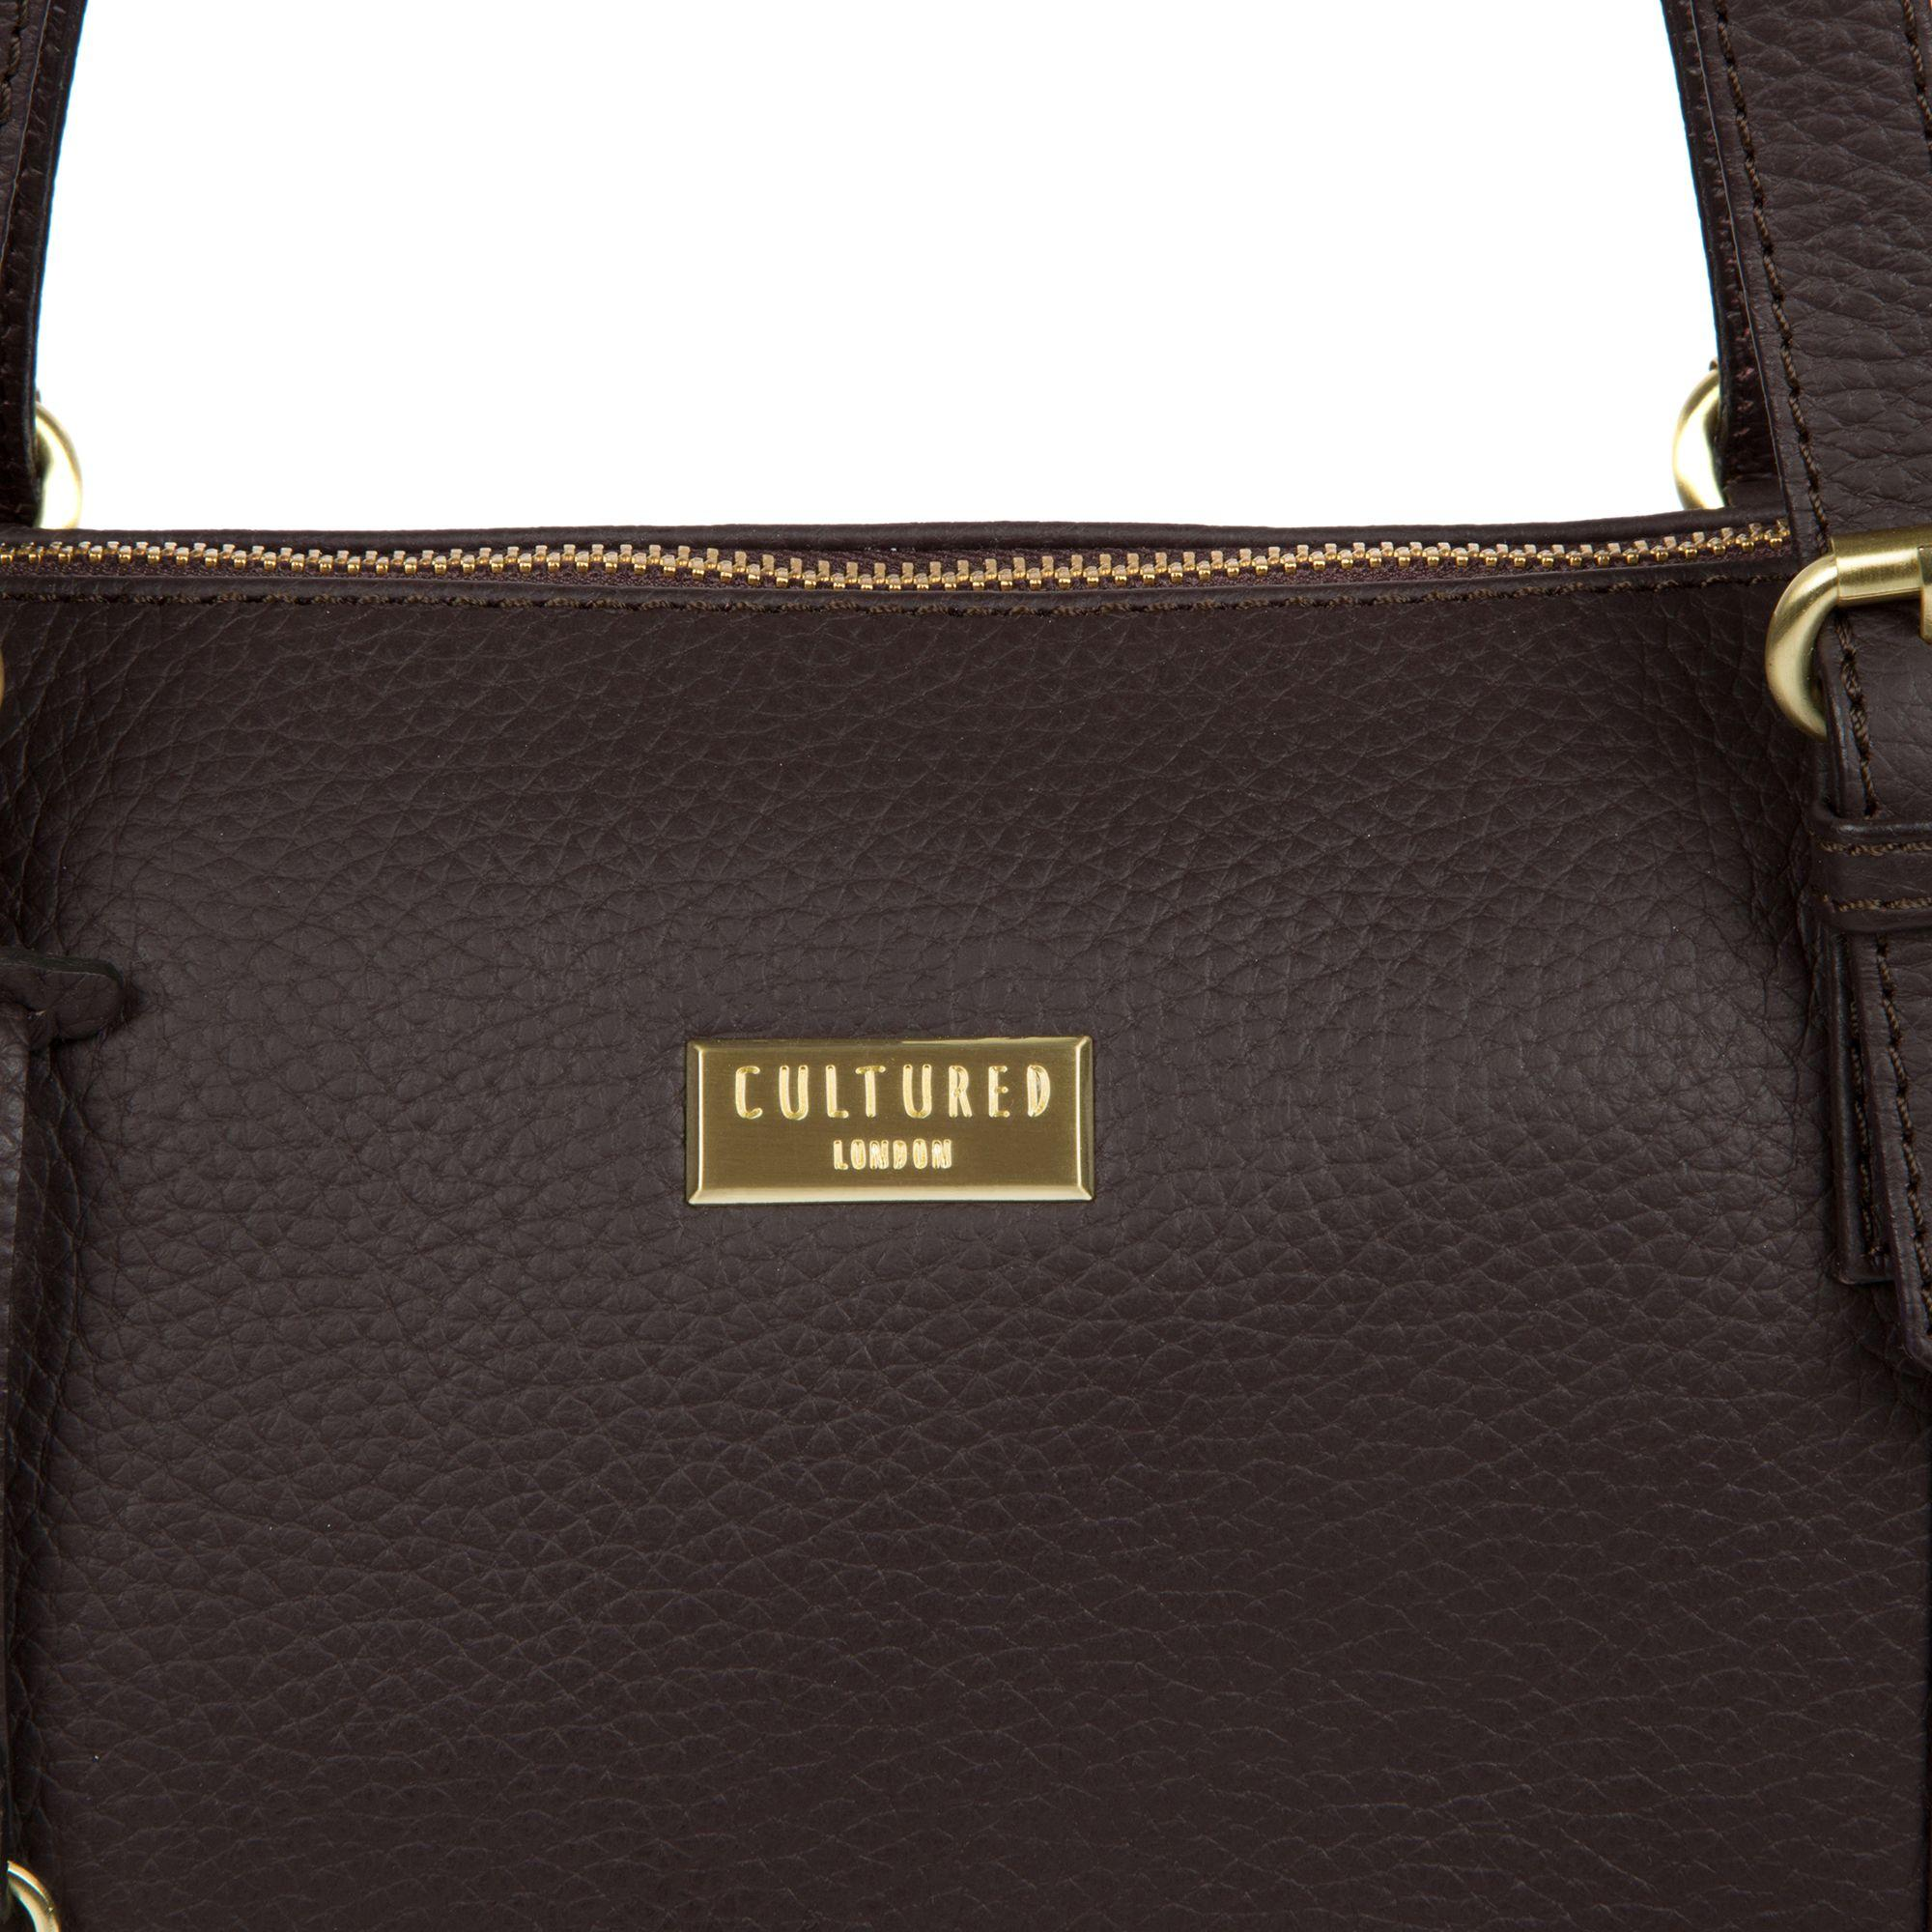 fc7cf9c999ae Cultured london dark chocolate pippa leather tote bag in brown lyst jpg  2000x2000 Pippa totes